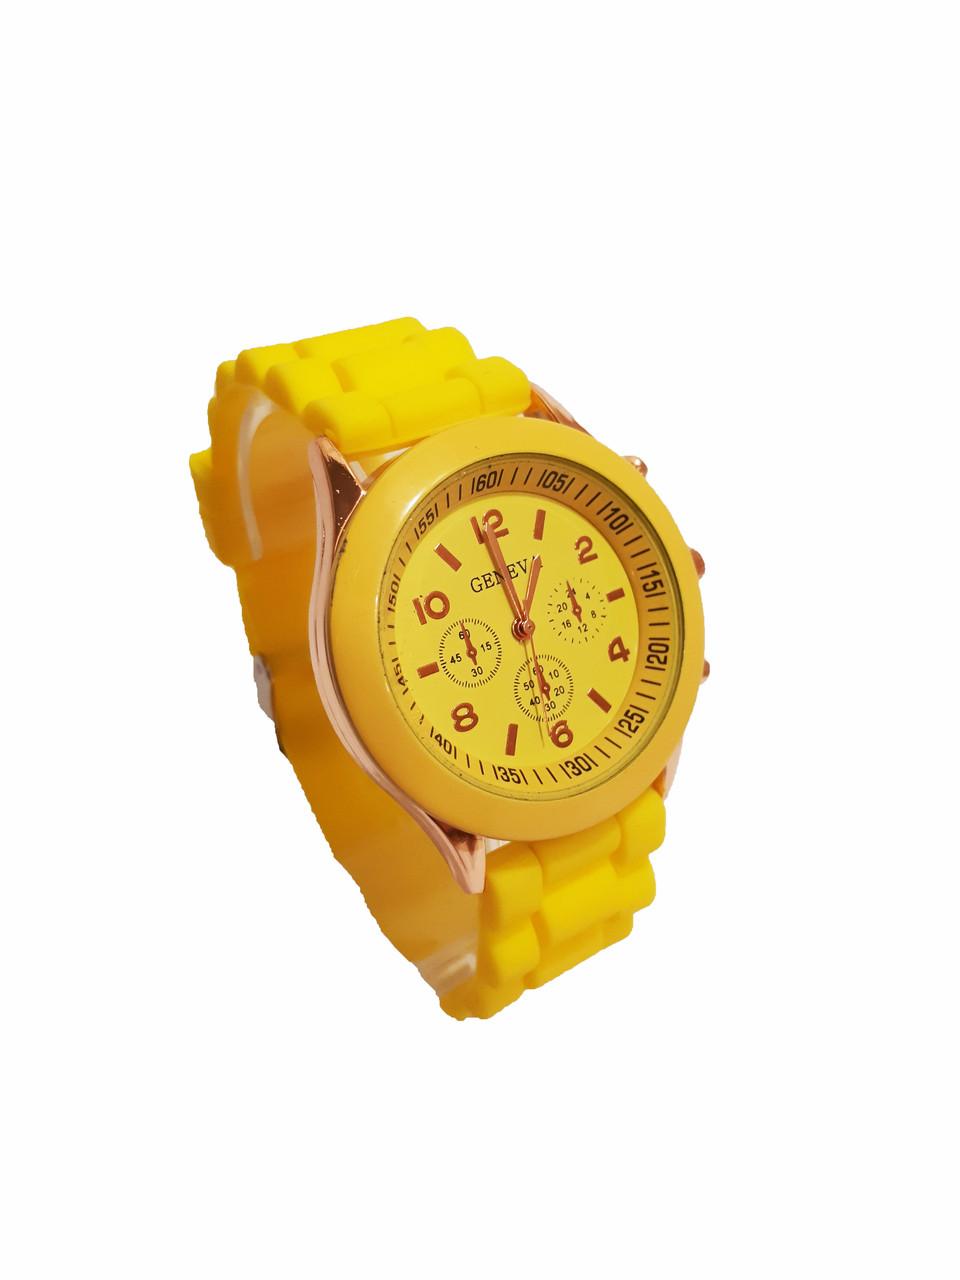 Часы кварцевые на силиконовом ремешке Geneva Желтый Желтый опт